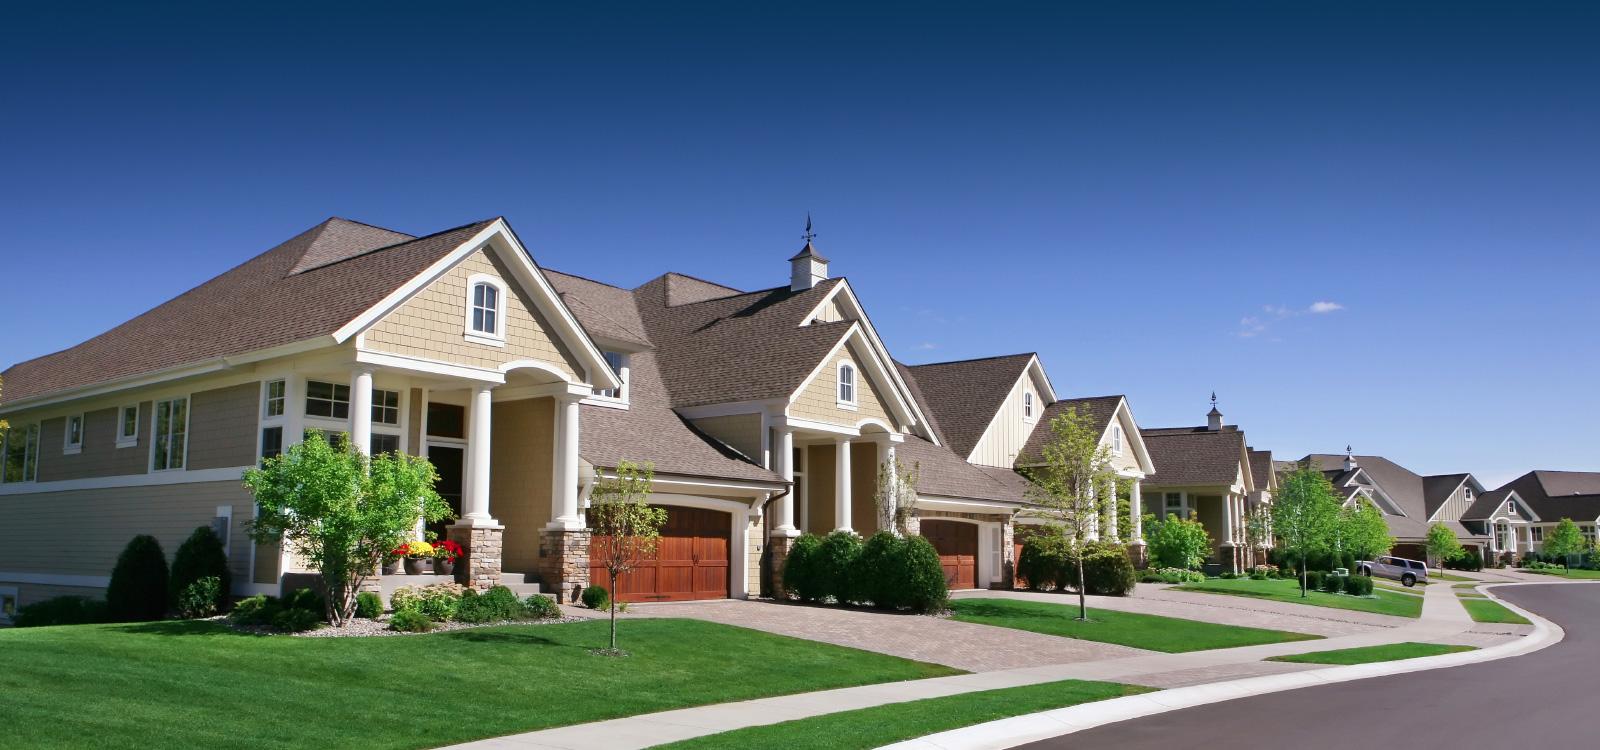 Home Inspection Checklist Henderson